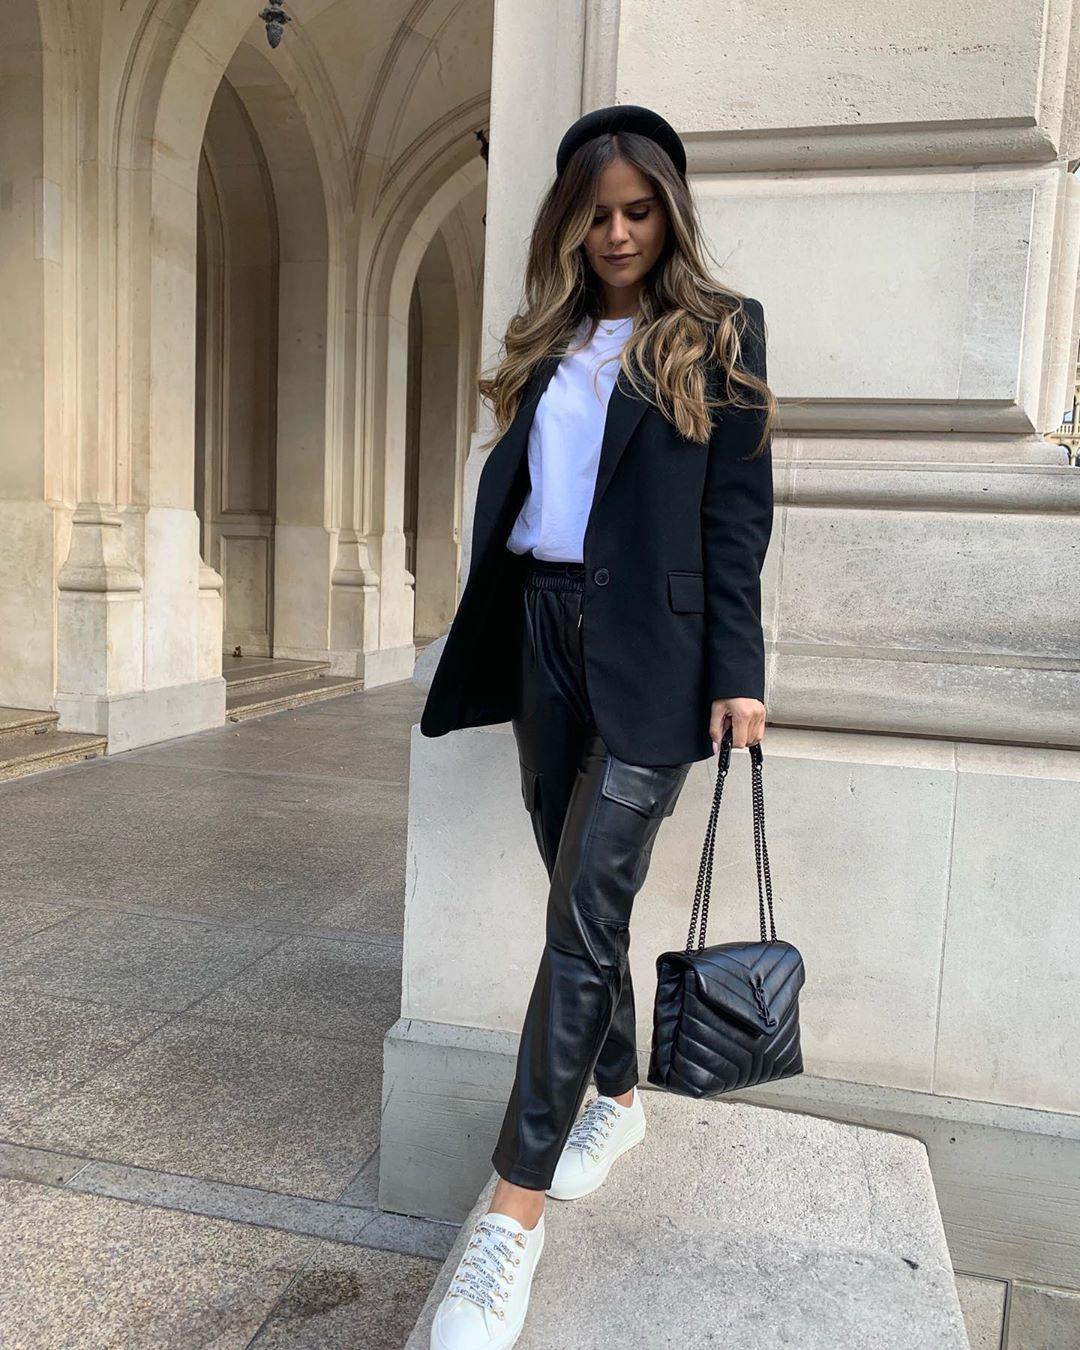 synthetic leather cargo pants de Zara sur ezgilkyaz